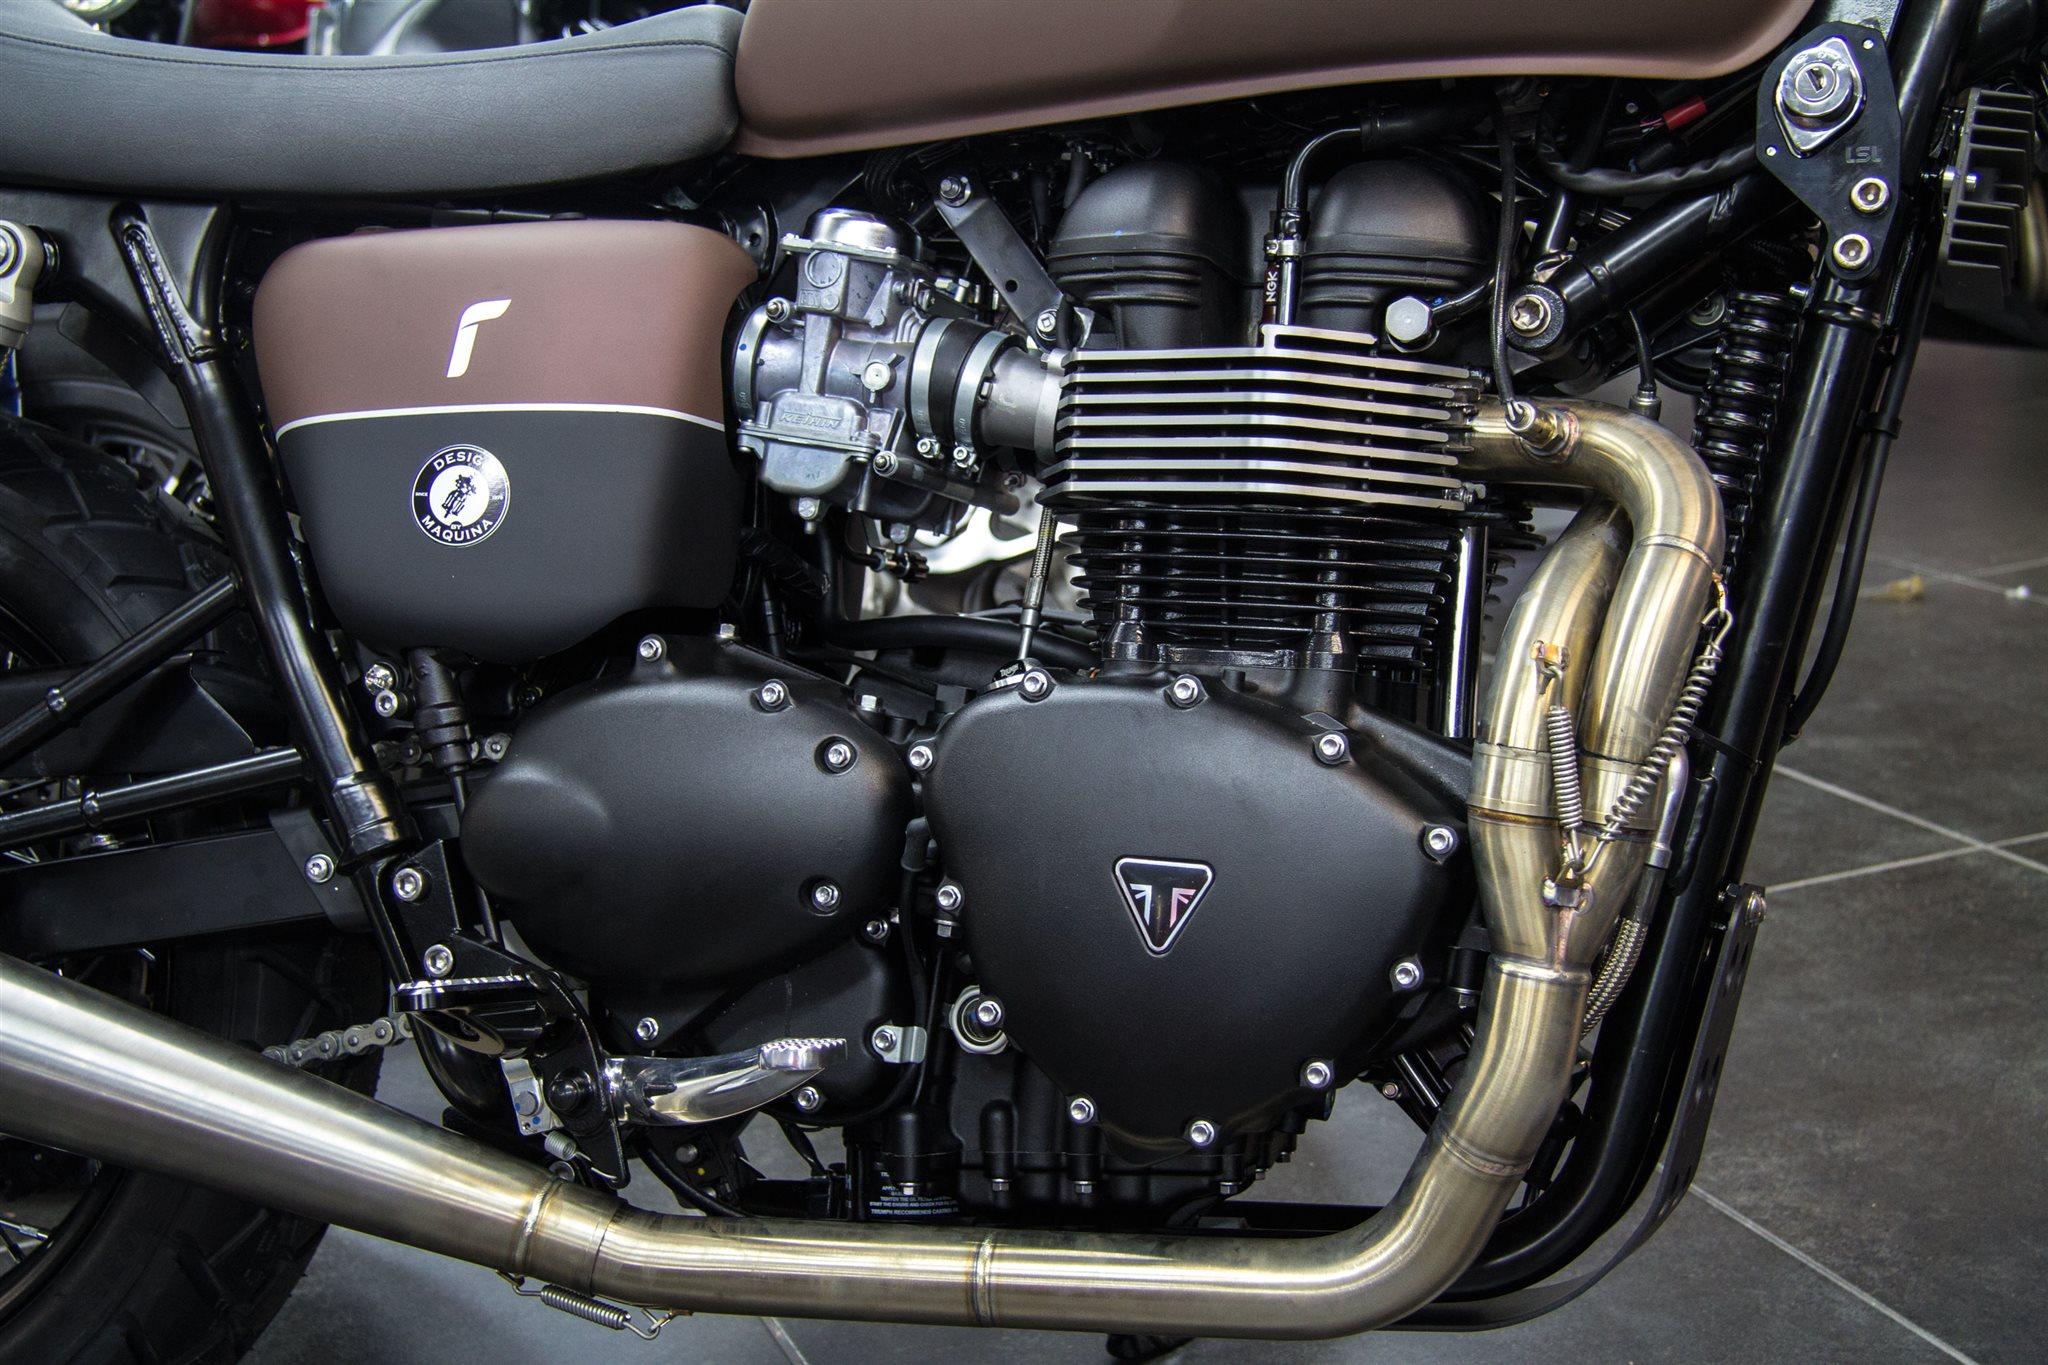 umgebautes motorrad triumph bonneville t100 von maquina. Black Bedroom Furniture Sets. Home Design Ideas